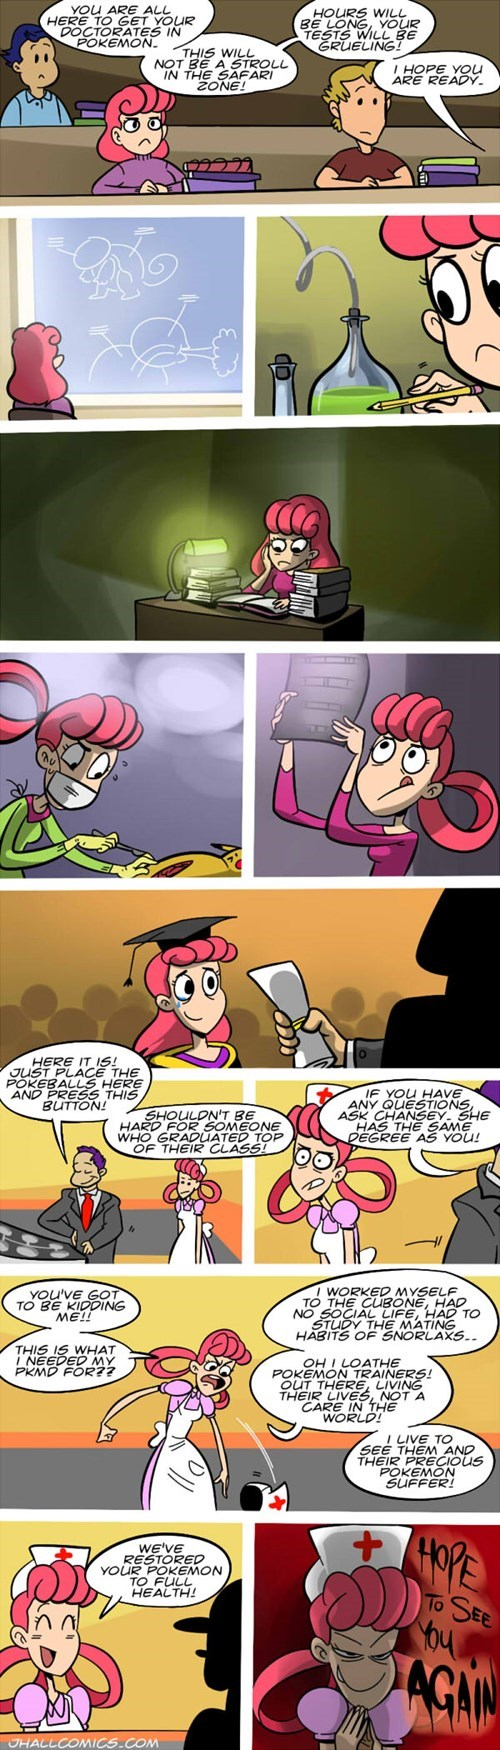 Pokémon,jhallcomics,comics